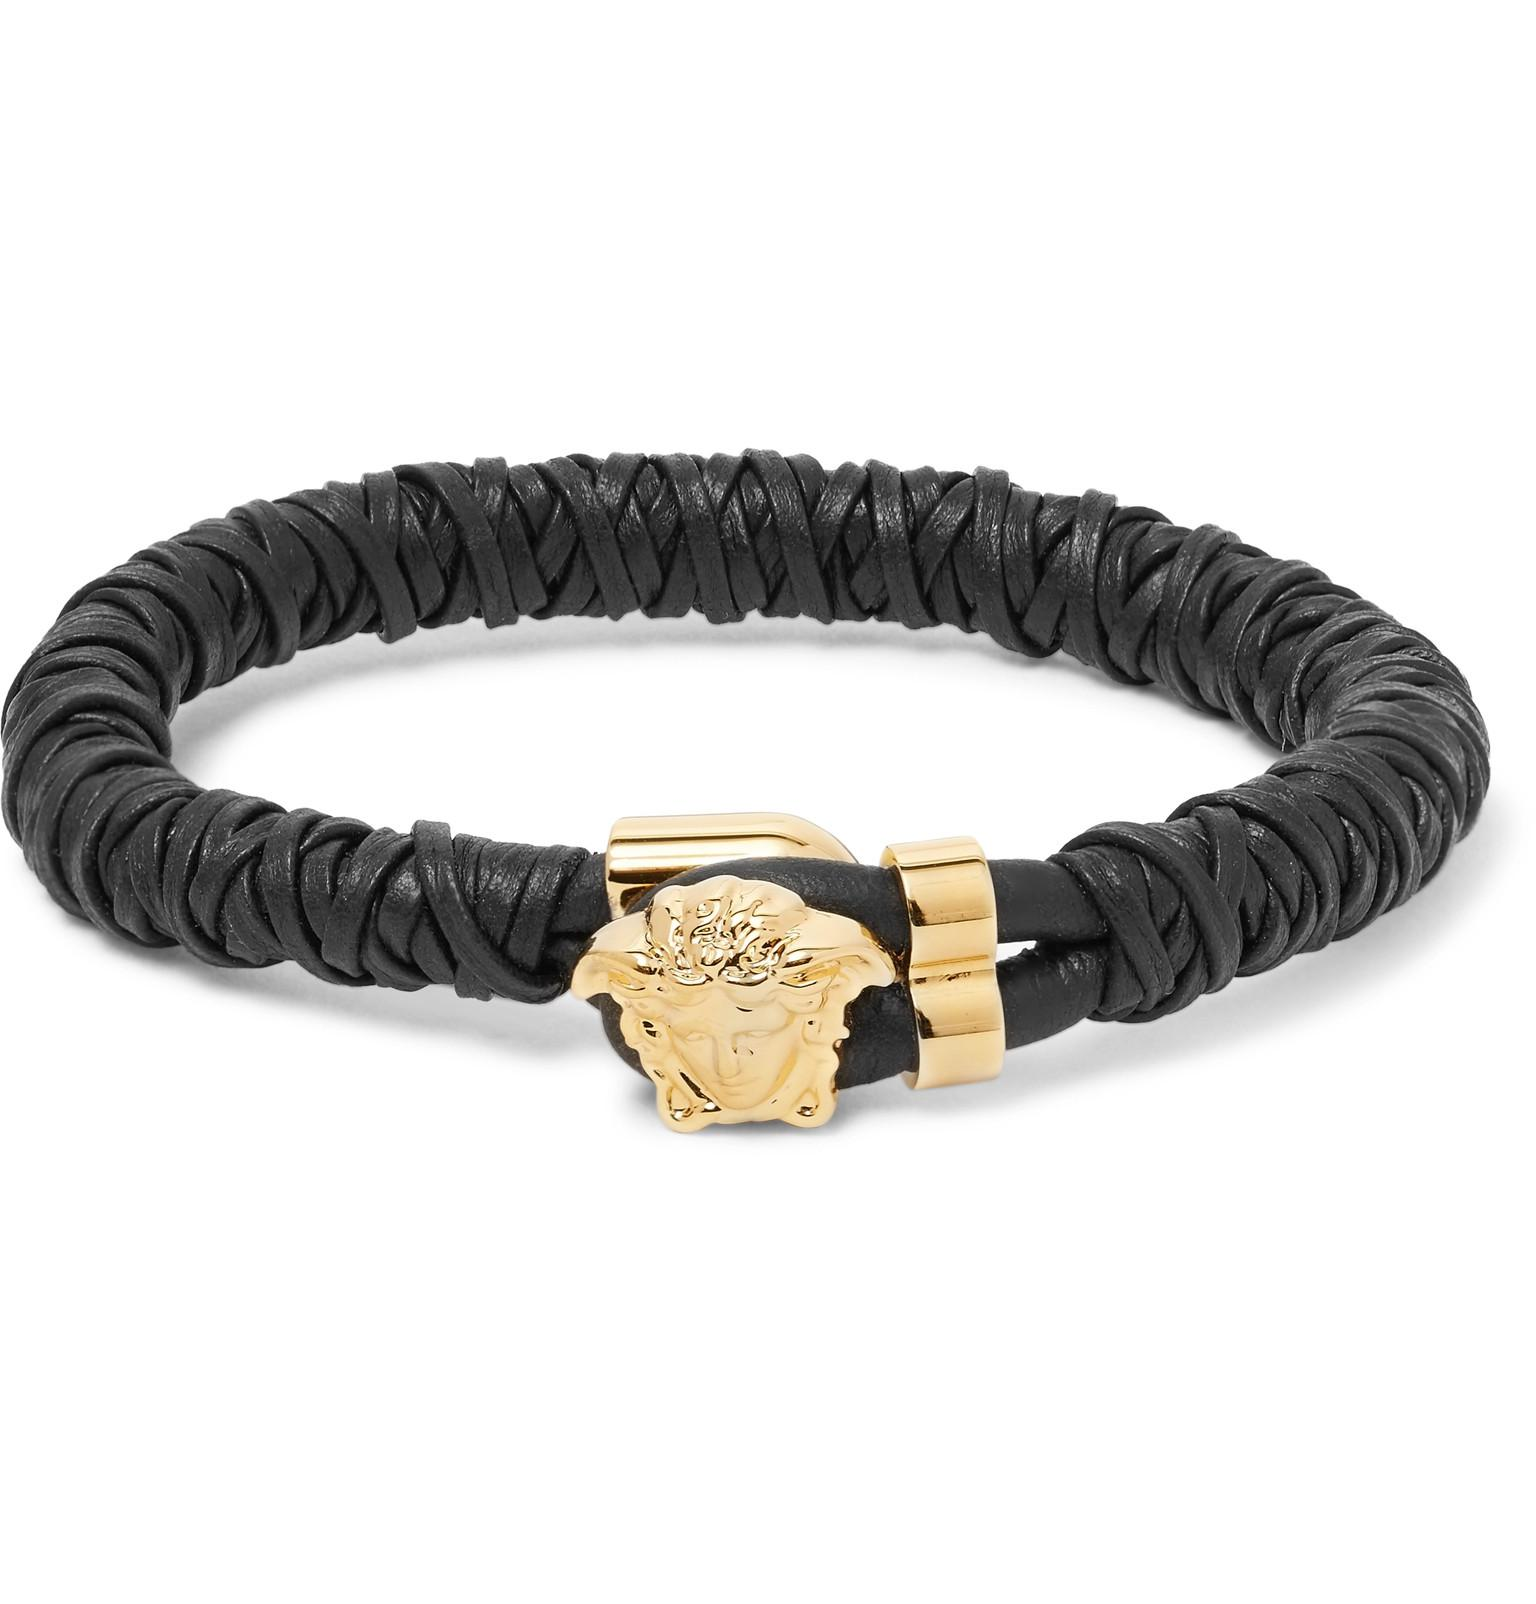 Woven Leather Gold Tone Bracelet